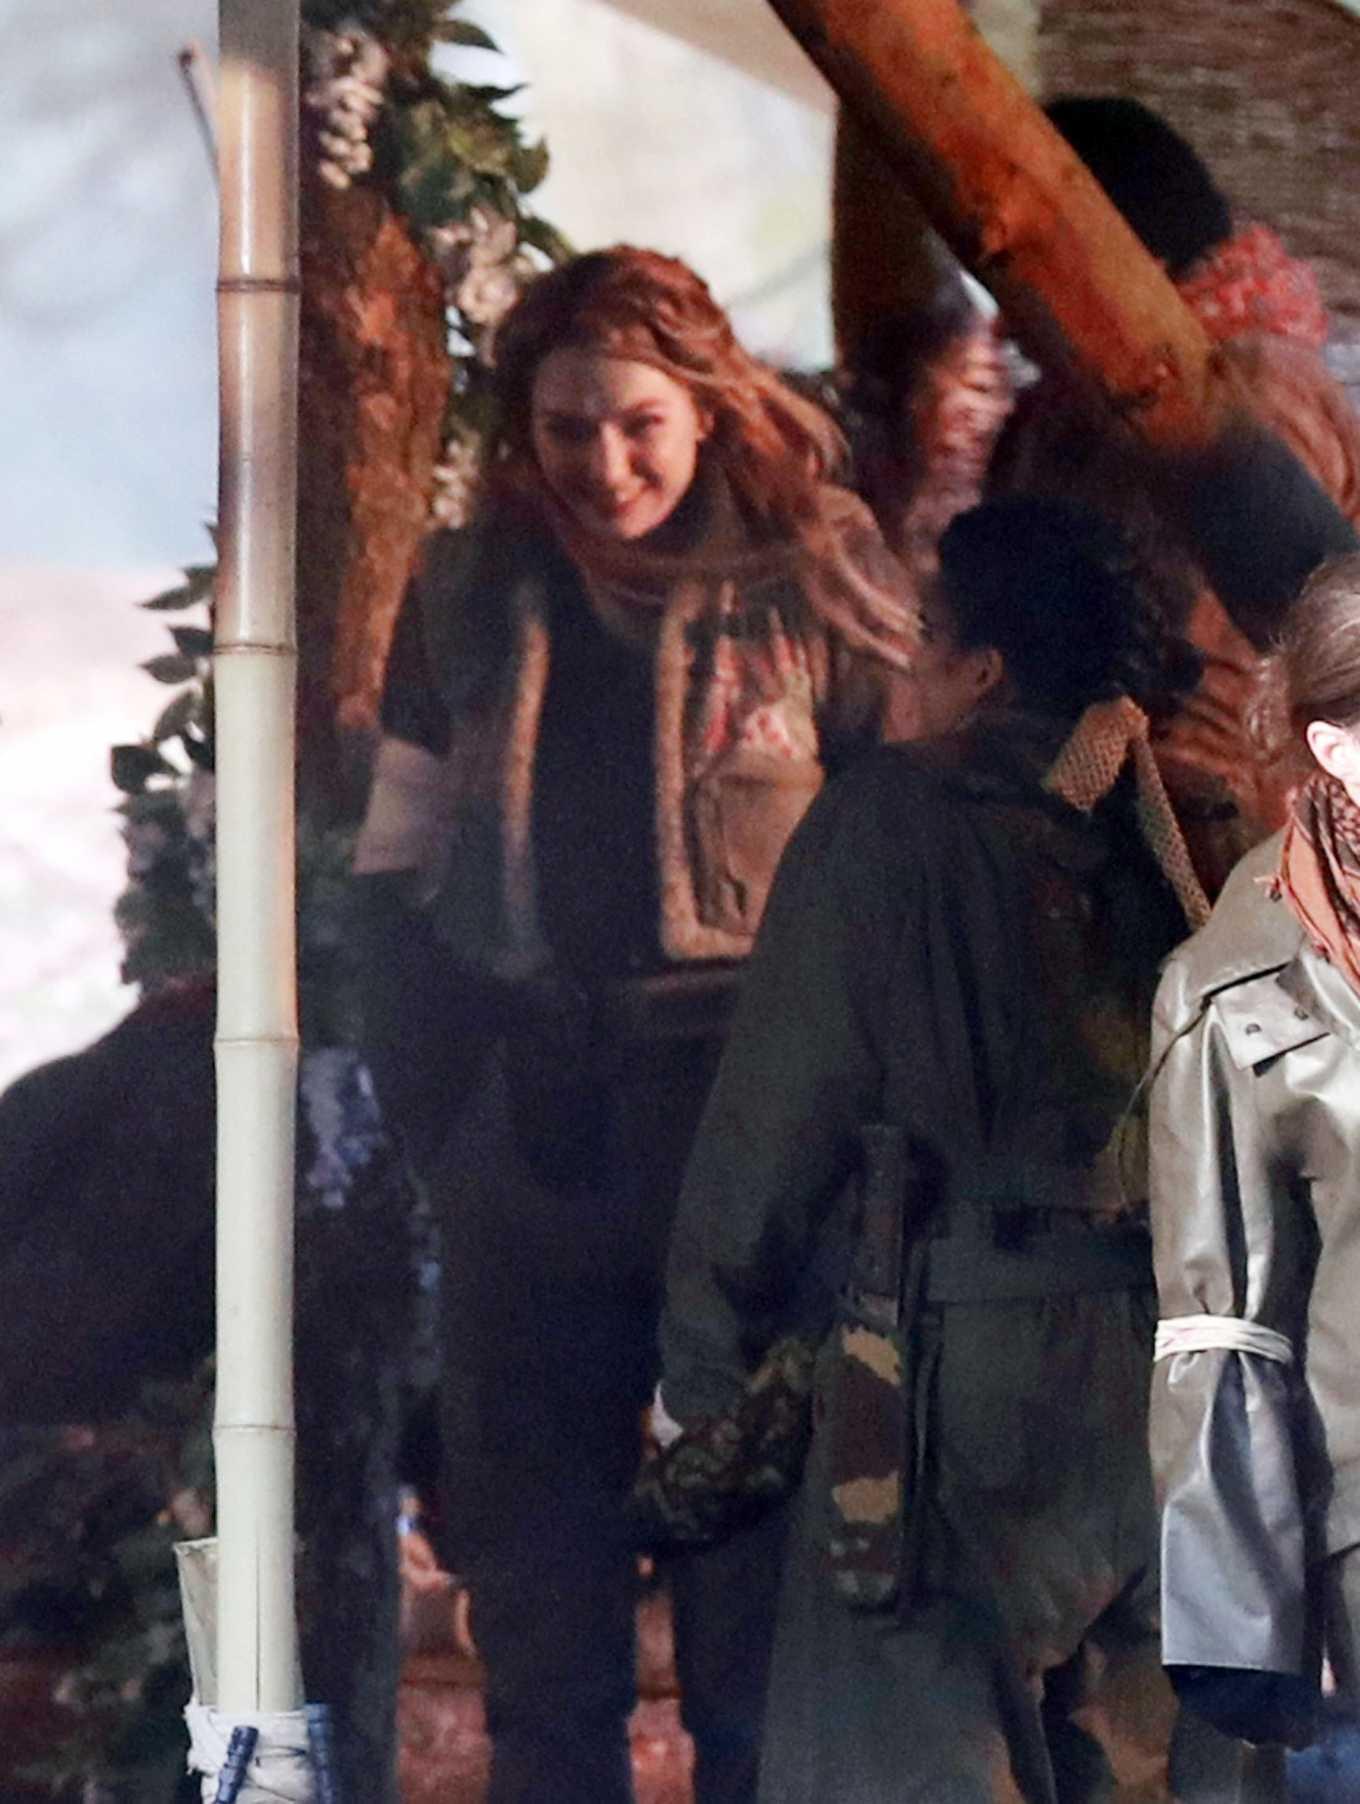 Eleanor Tomlinson 2020 : Eleanor Tomlinson – Filming scenes for the upcoming Sky Drama Intergalactic in Cheshire-03